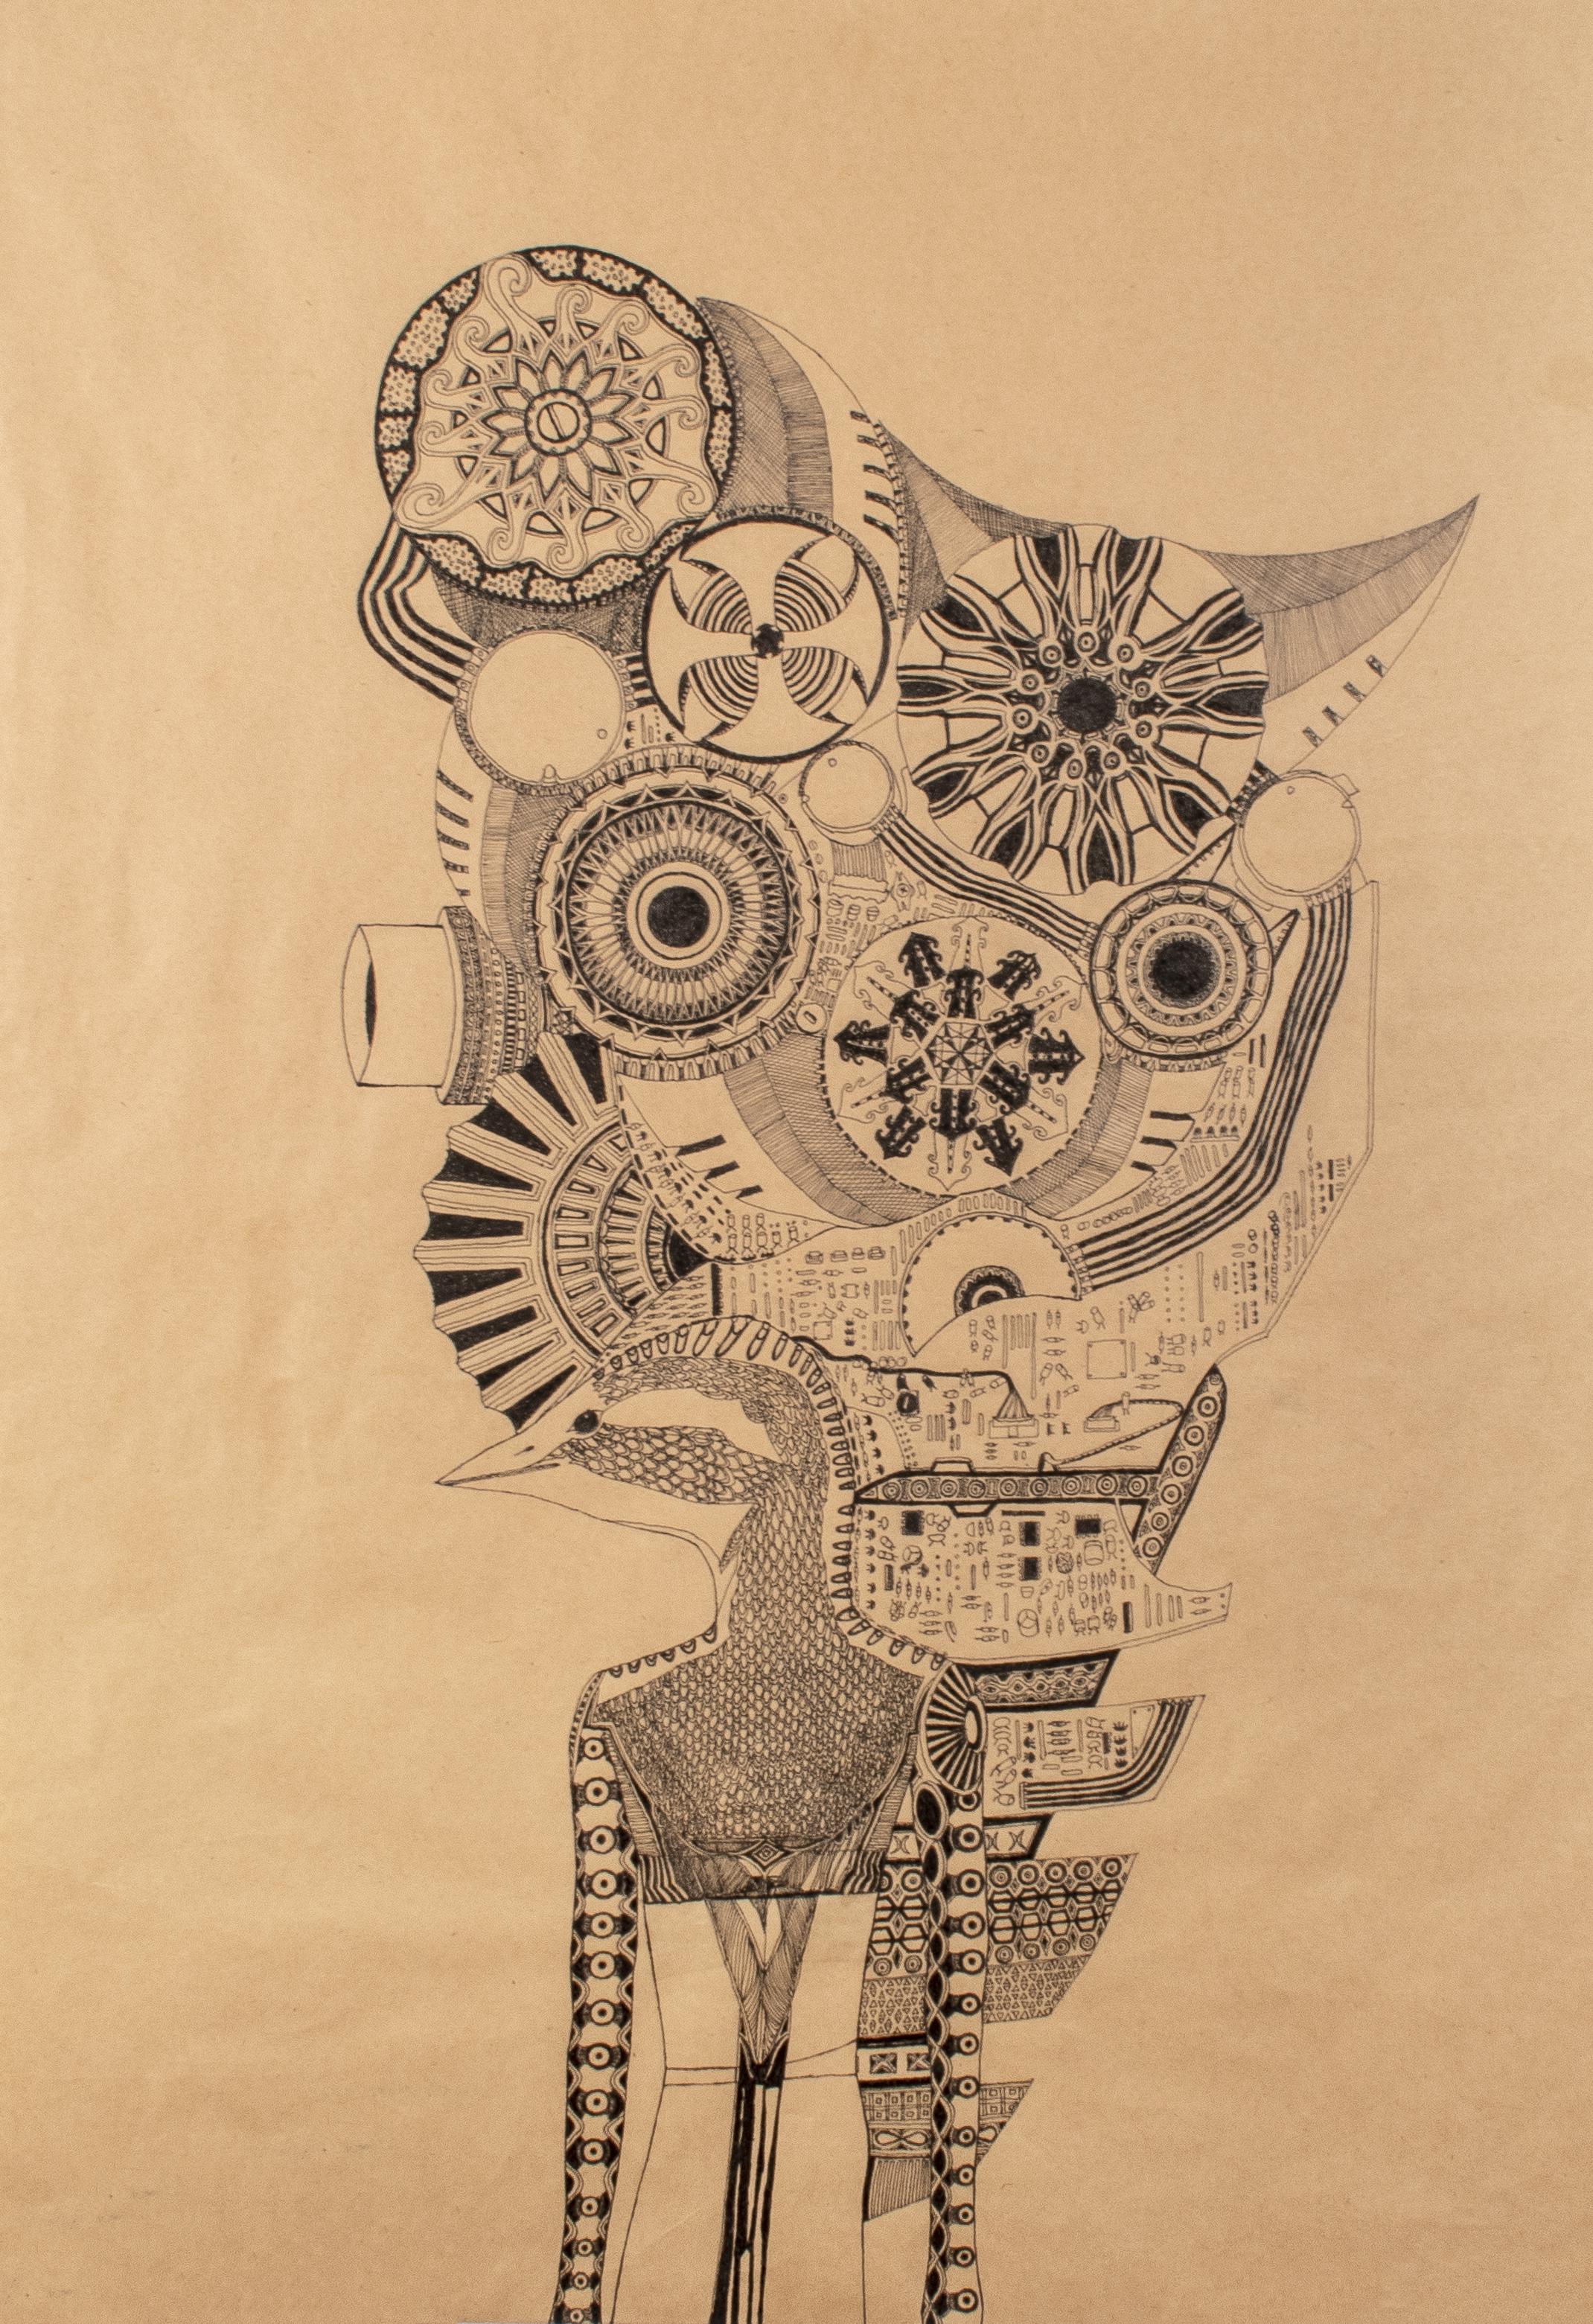 Untitled (63) Ink pen on Kraft paper, 51x73cm Photo by Ellie Walmsley